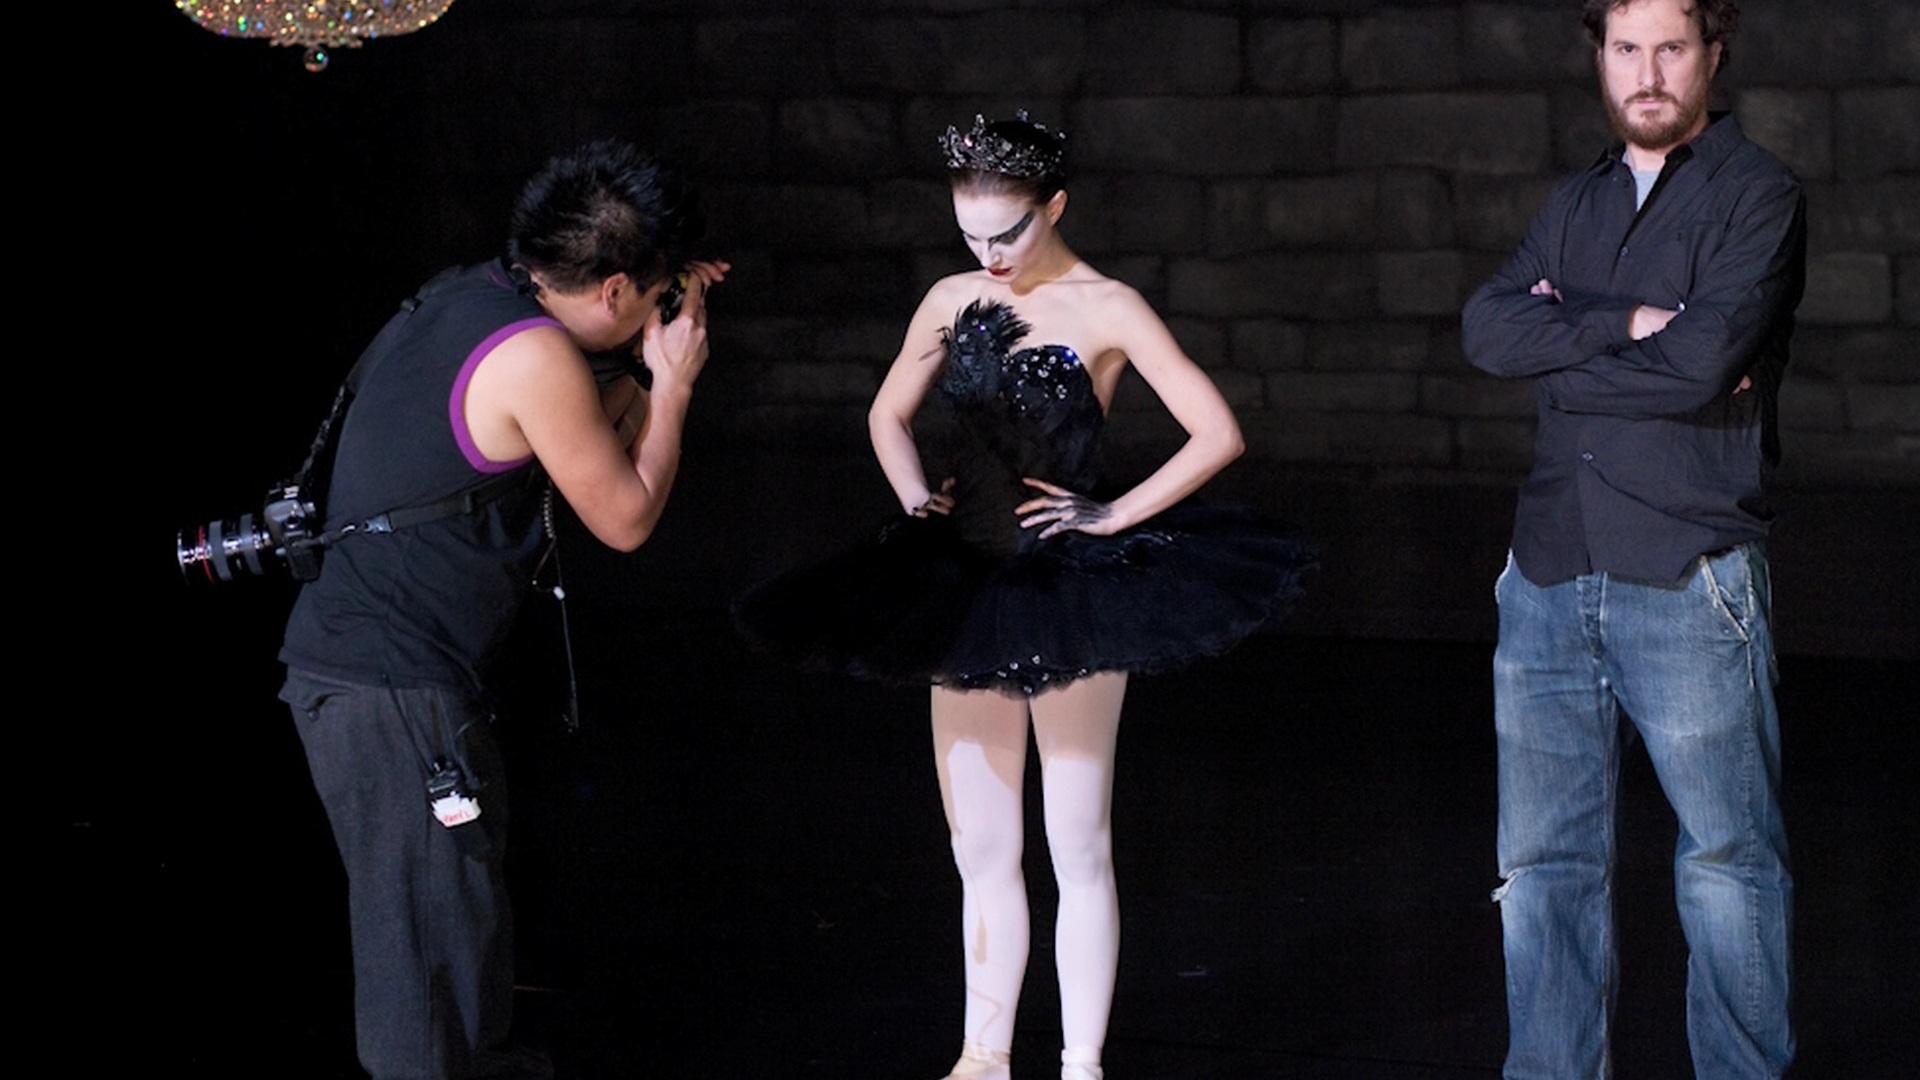 Black-Swan-Natalie-Portman-Fanpop-wallpaper-wp3603443